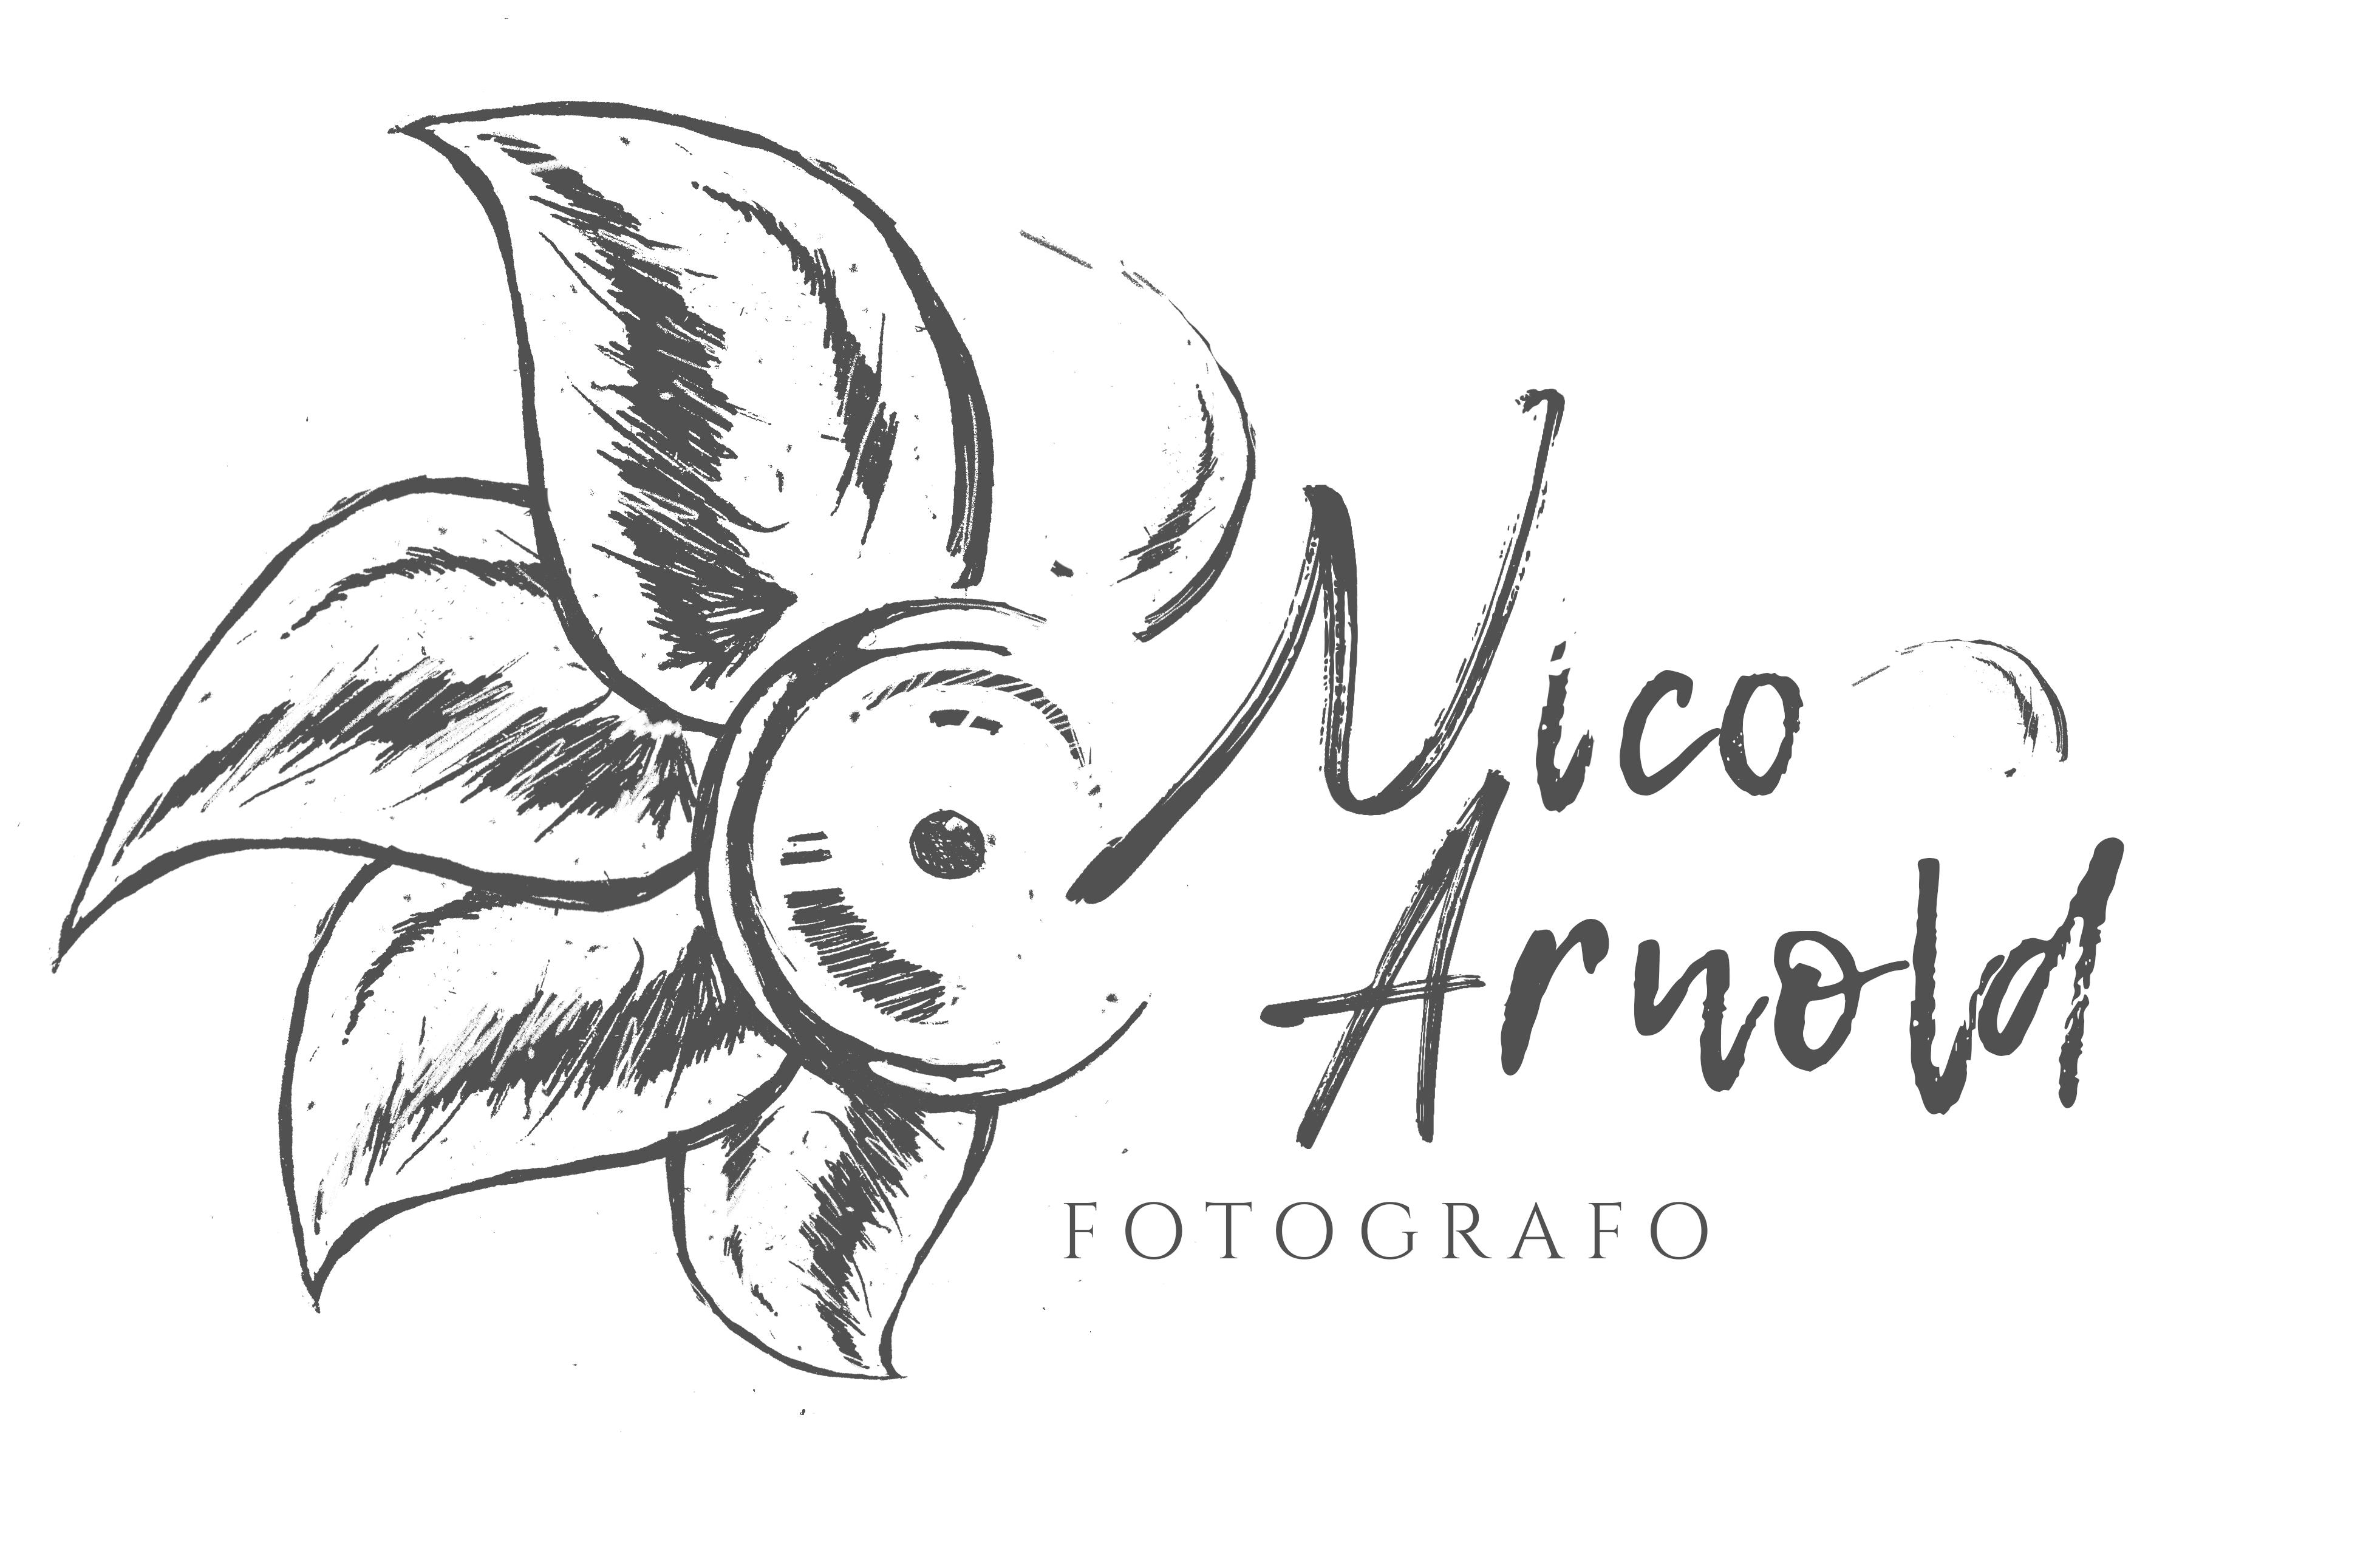 Nico Arnold Fotografo